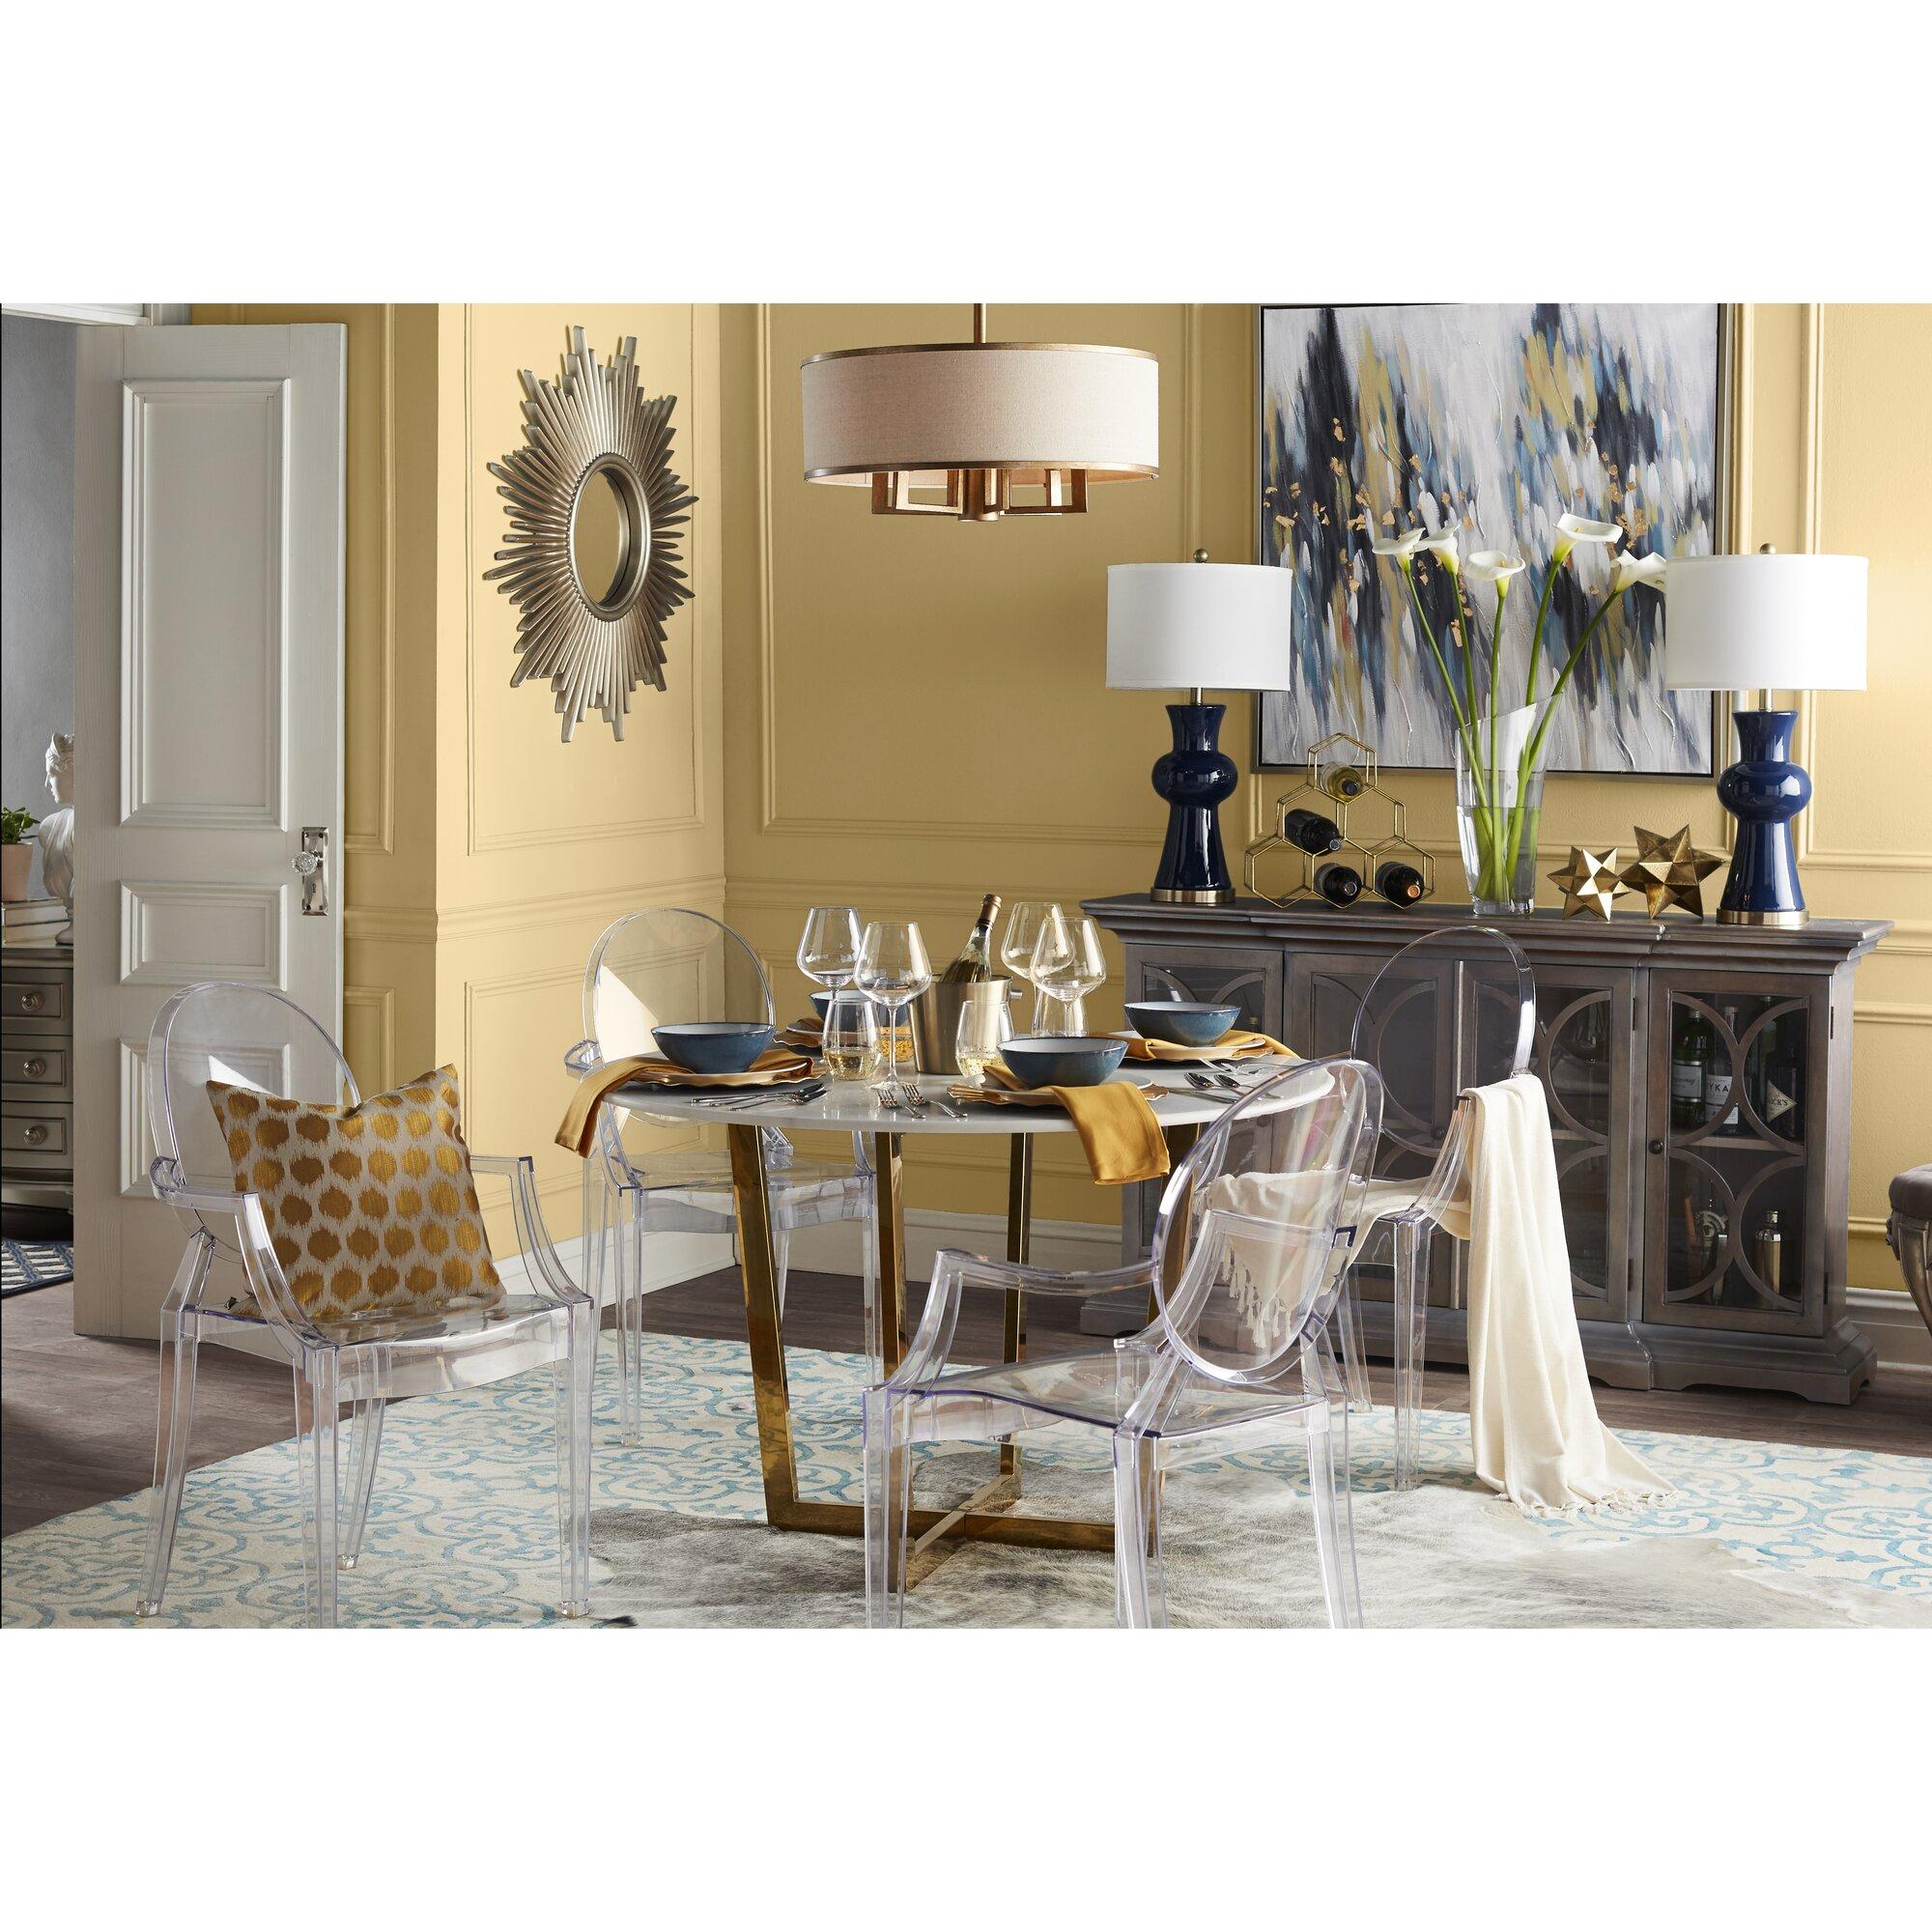 kartell louis ghost arm chair reviews wayfair. Black Bedroom Furniture Sets. Home Design Ideas